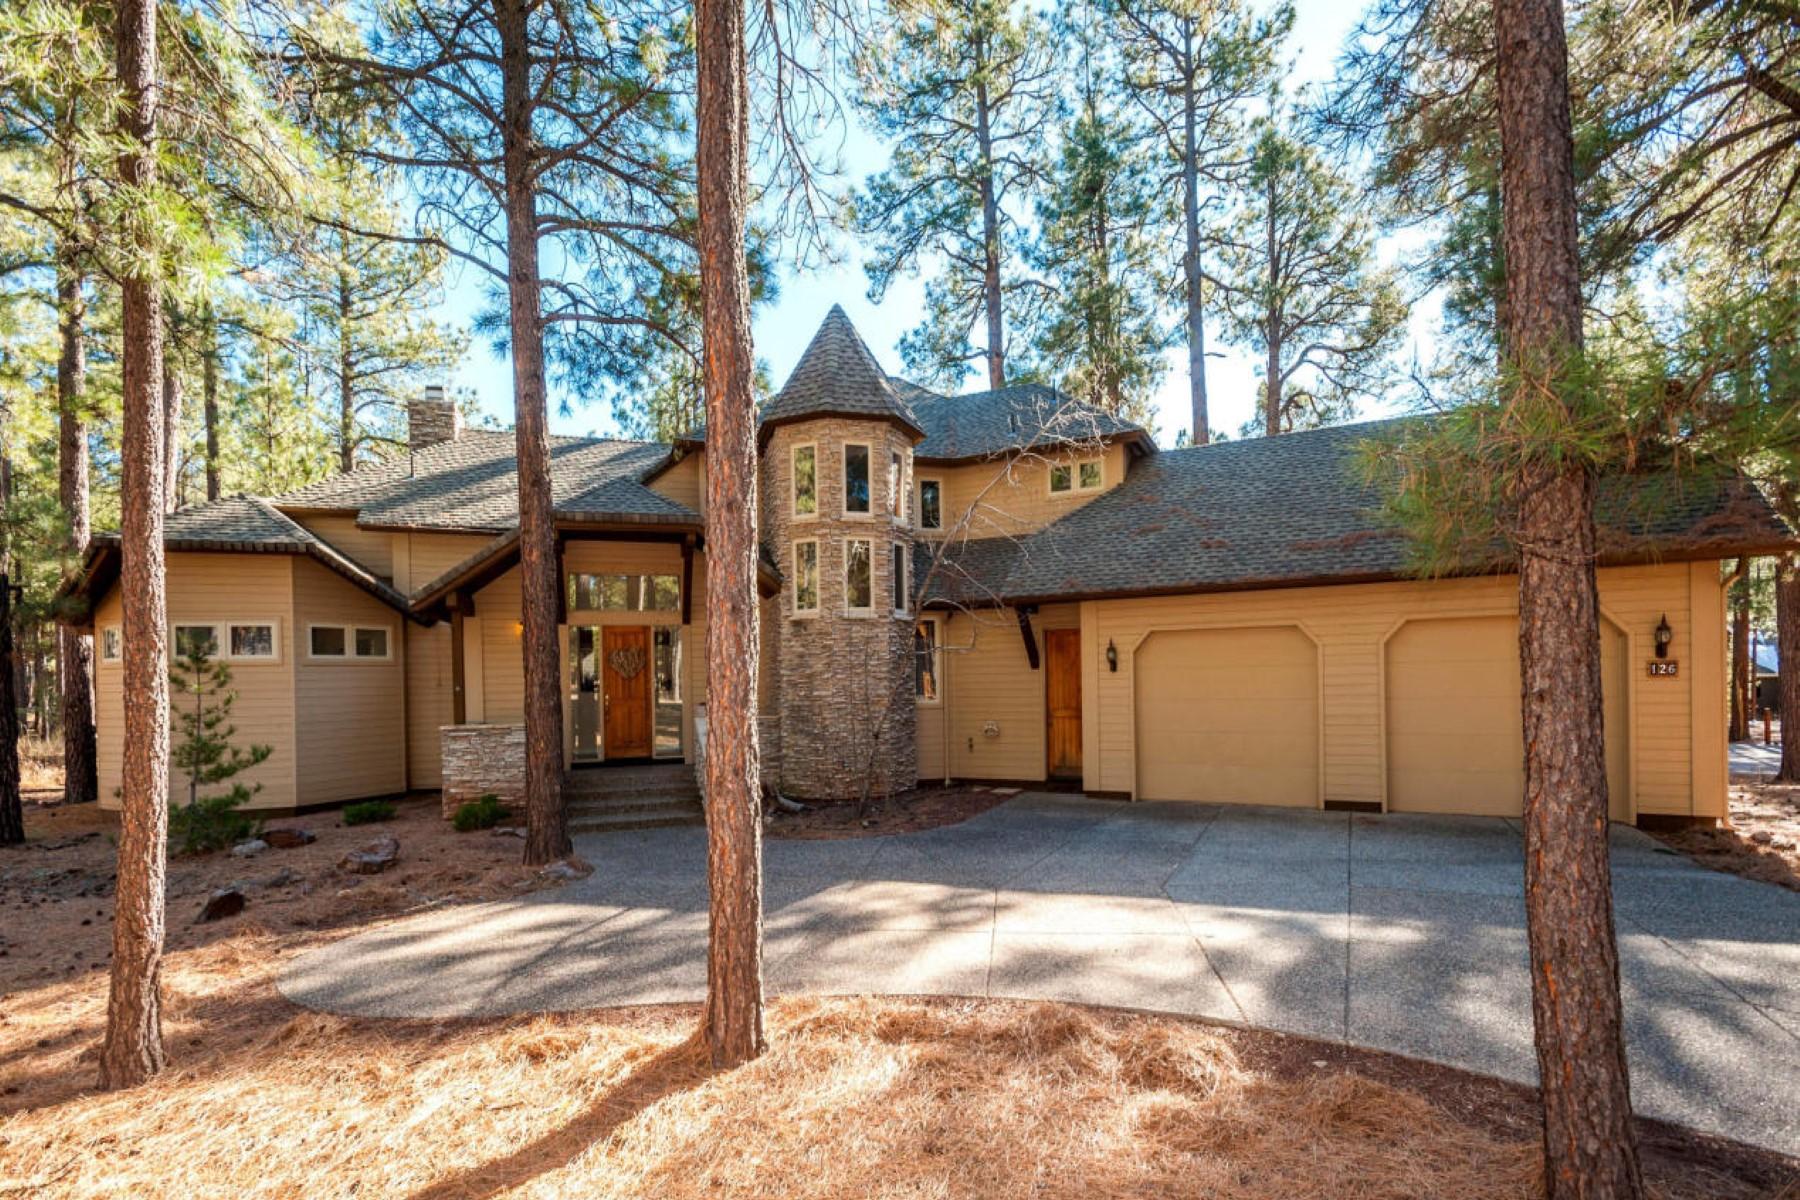 Vivienda unifamiliar por un Venta en Wonderful home situated within the gates of Forest Highland golf club 2199 W John Hance Flagstaff, Arizona 86005 Estados Unidos